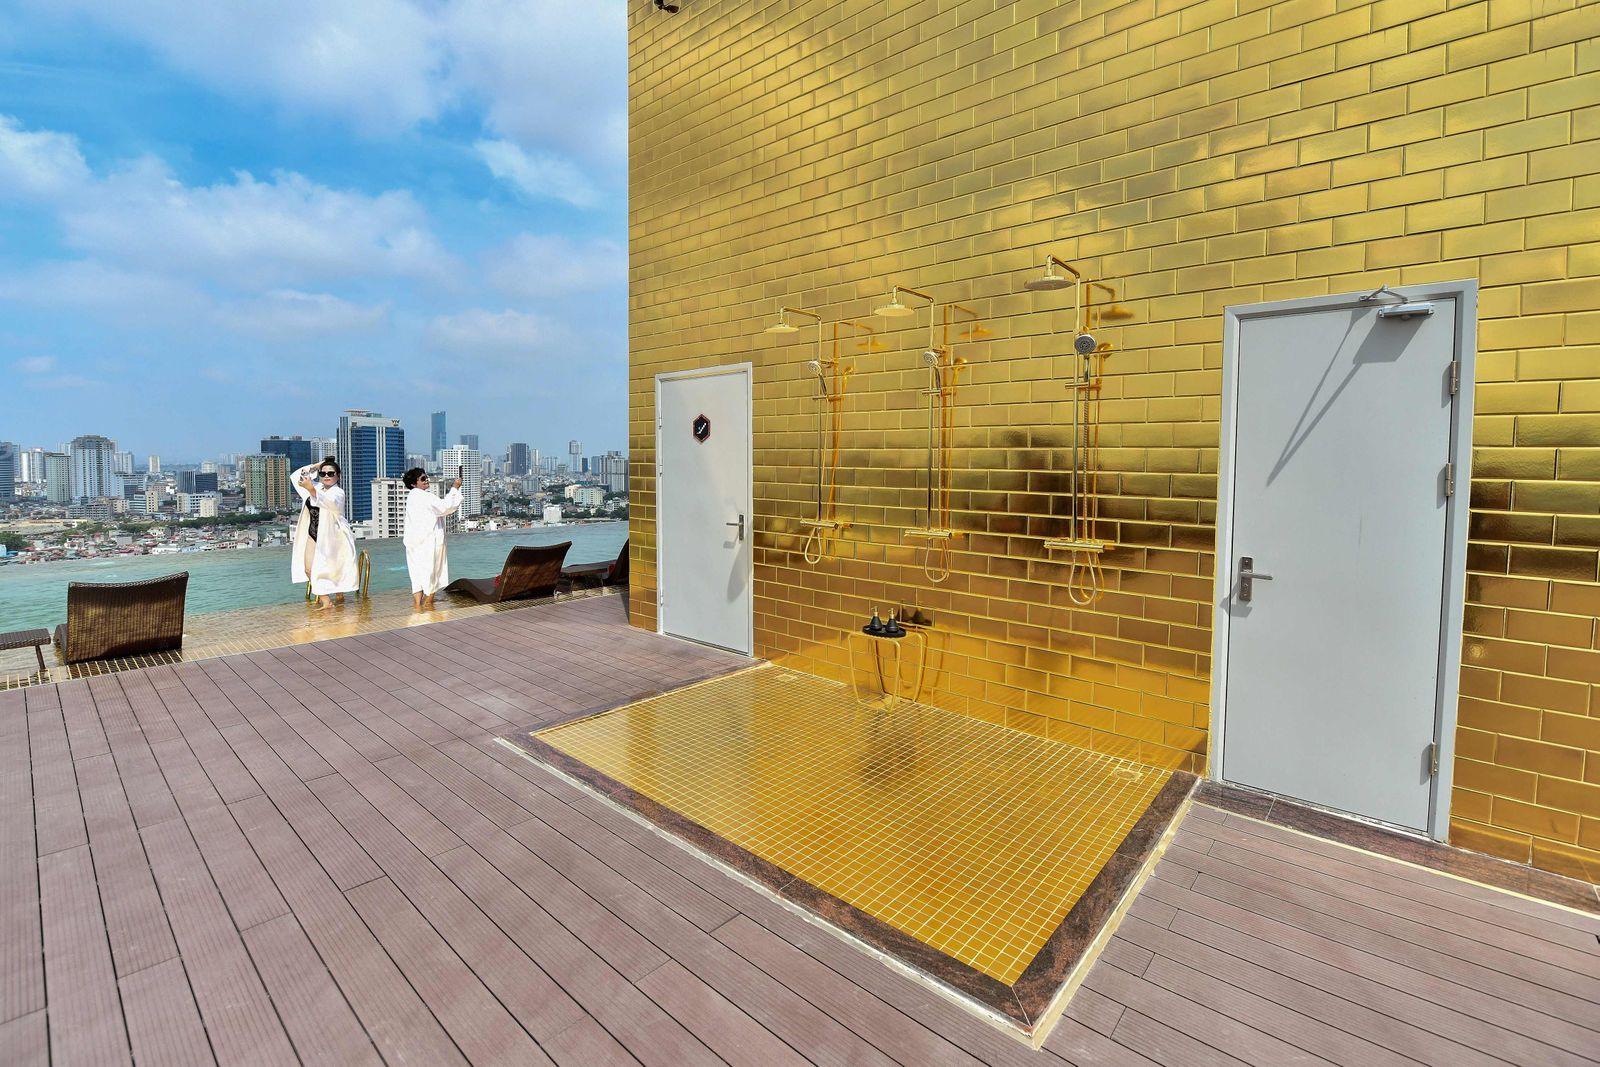 VIETNAM-ECONOMY-LUXURY-GOLD-HOTEL